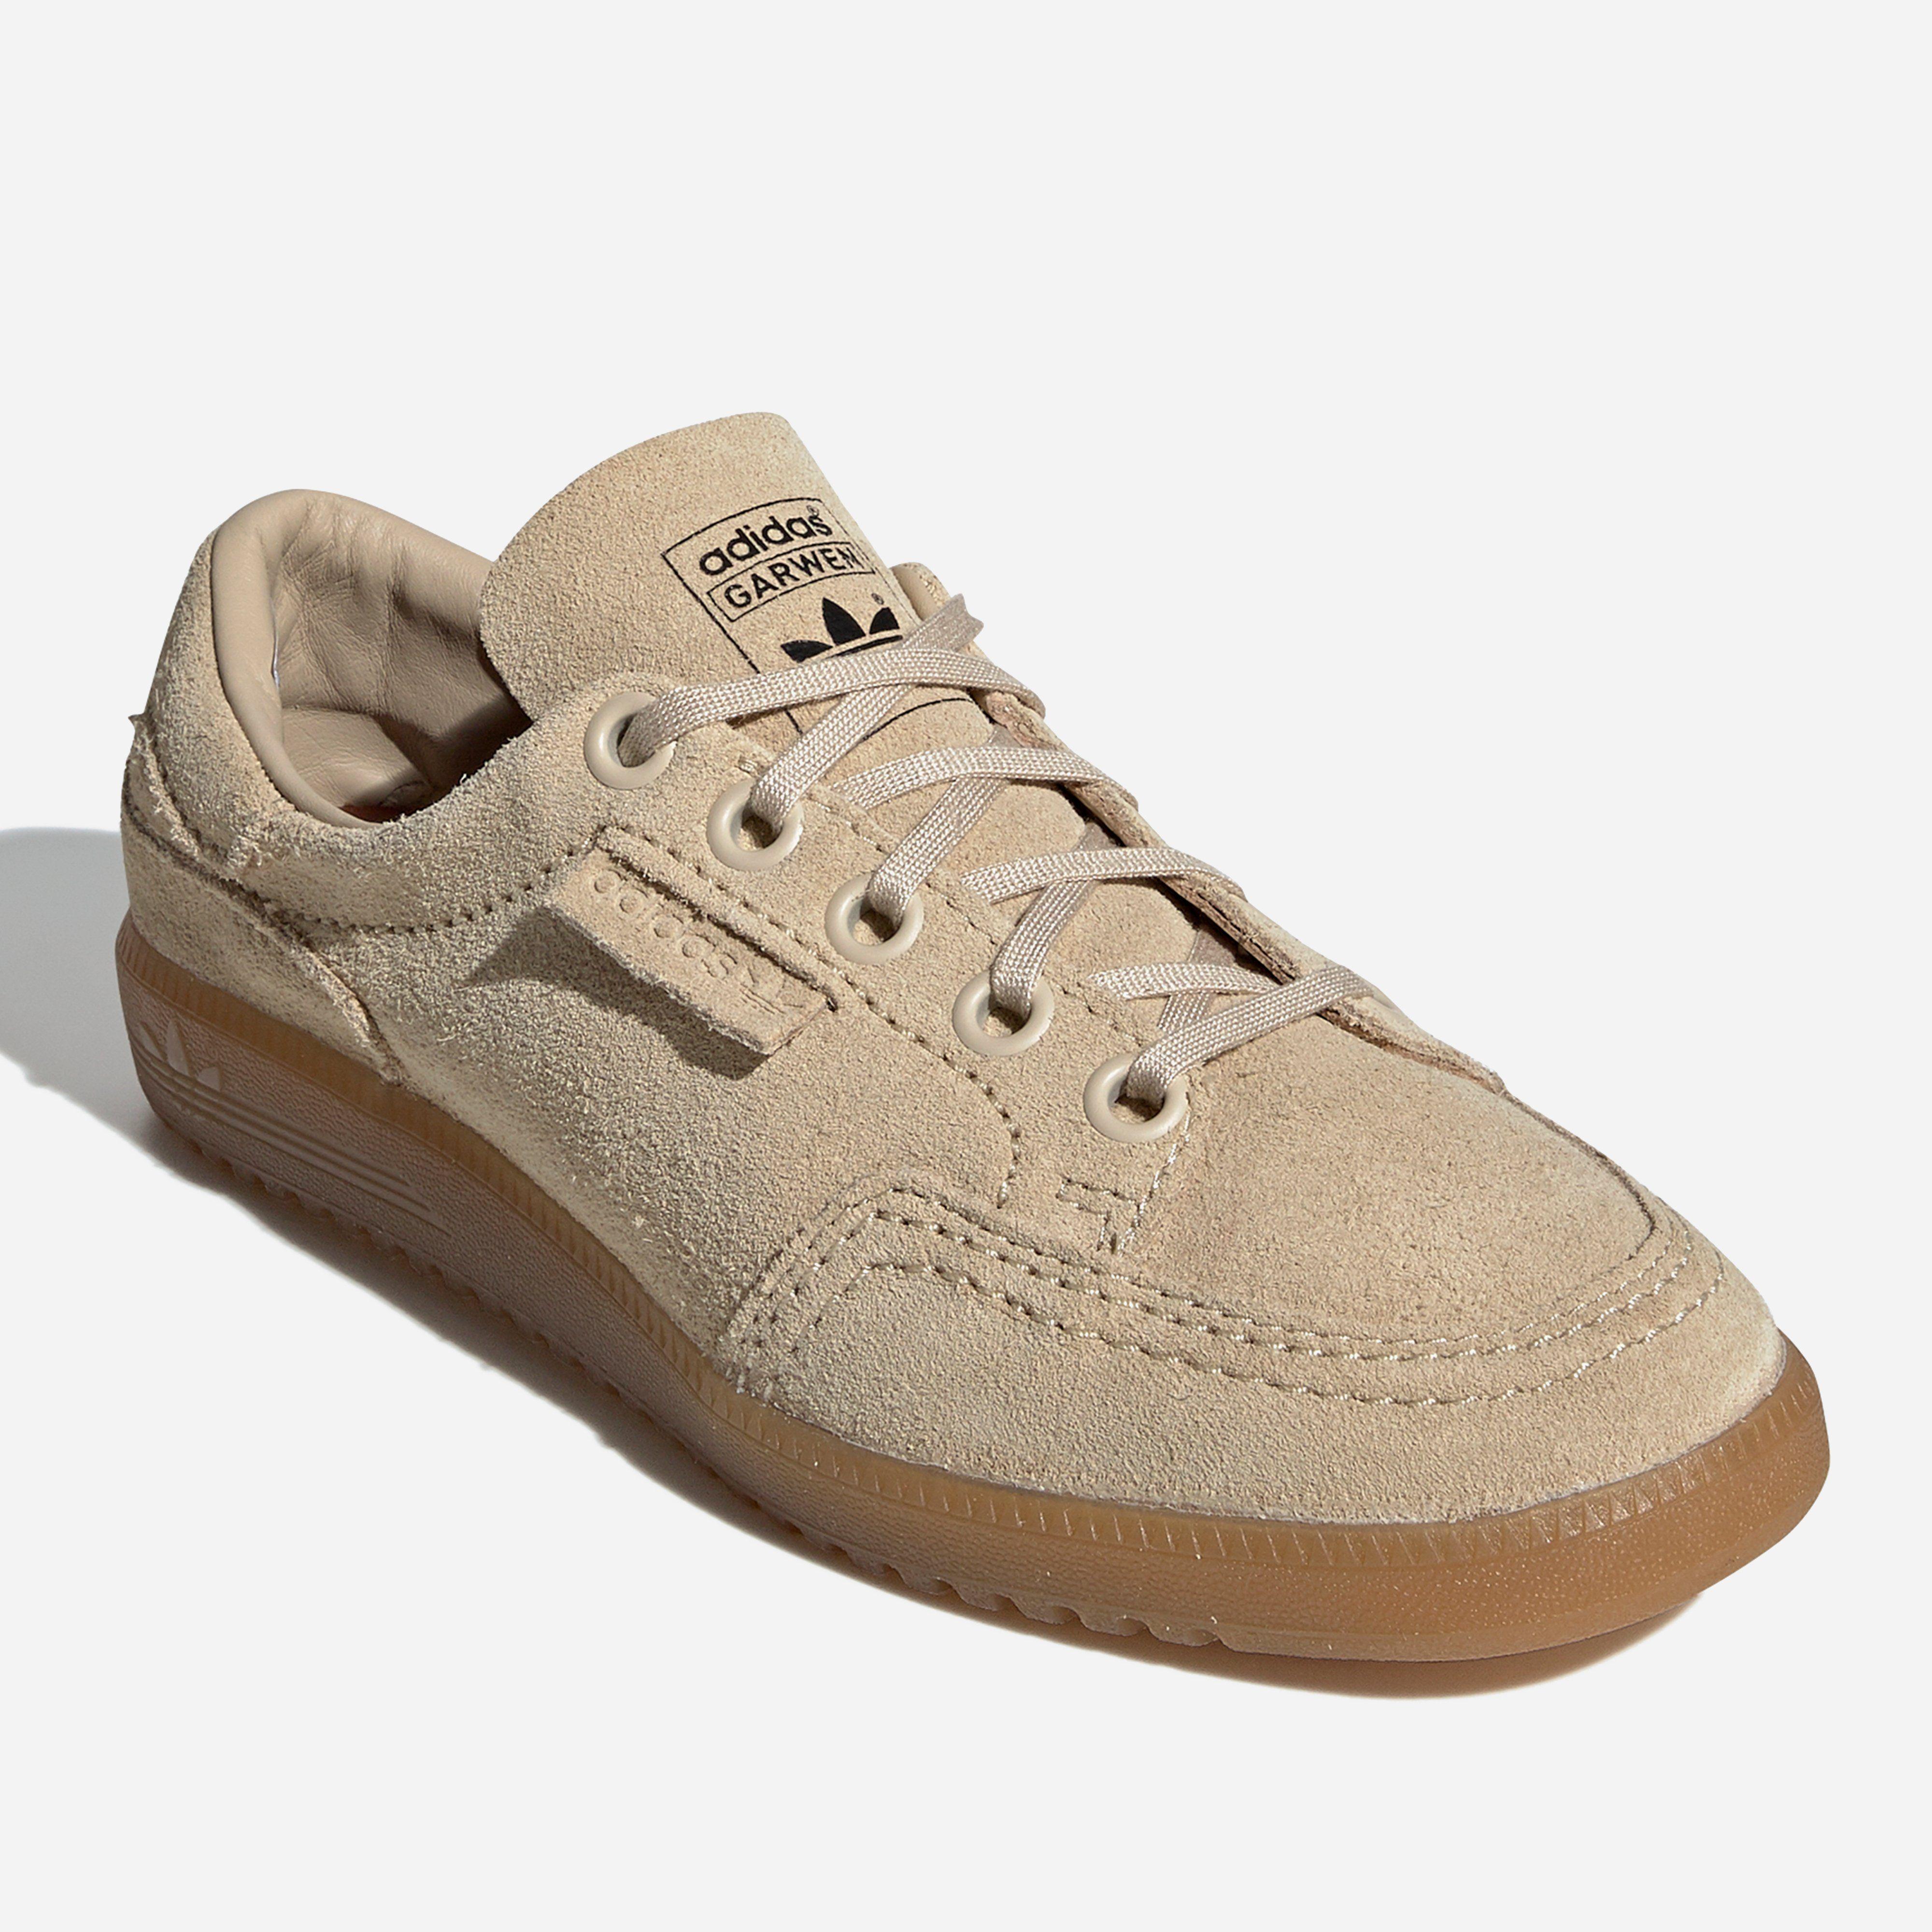 adidas Spezial by Union LA Garwen